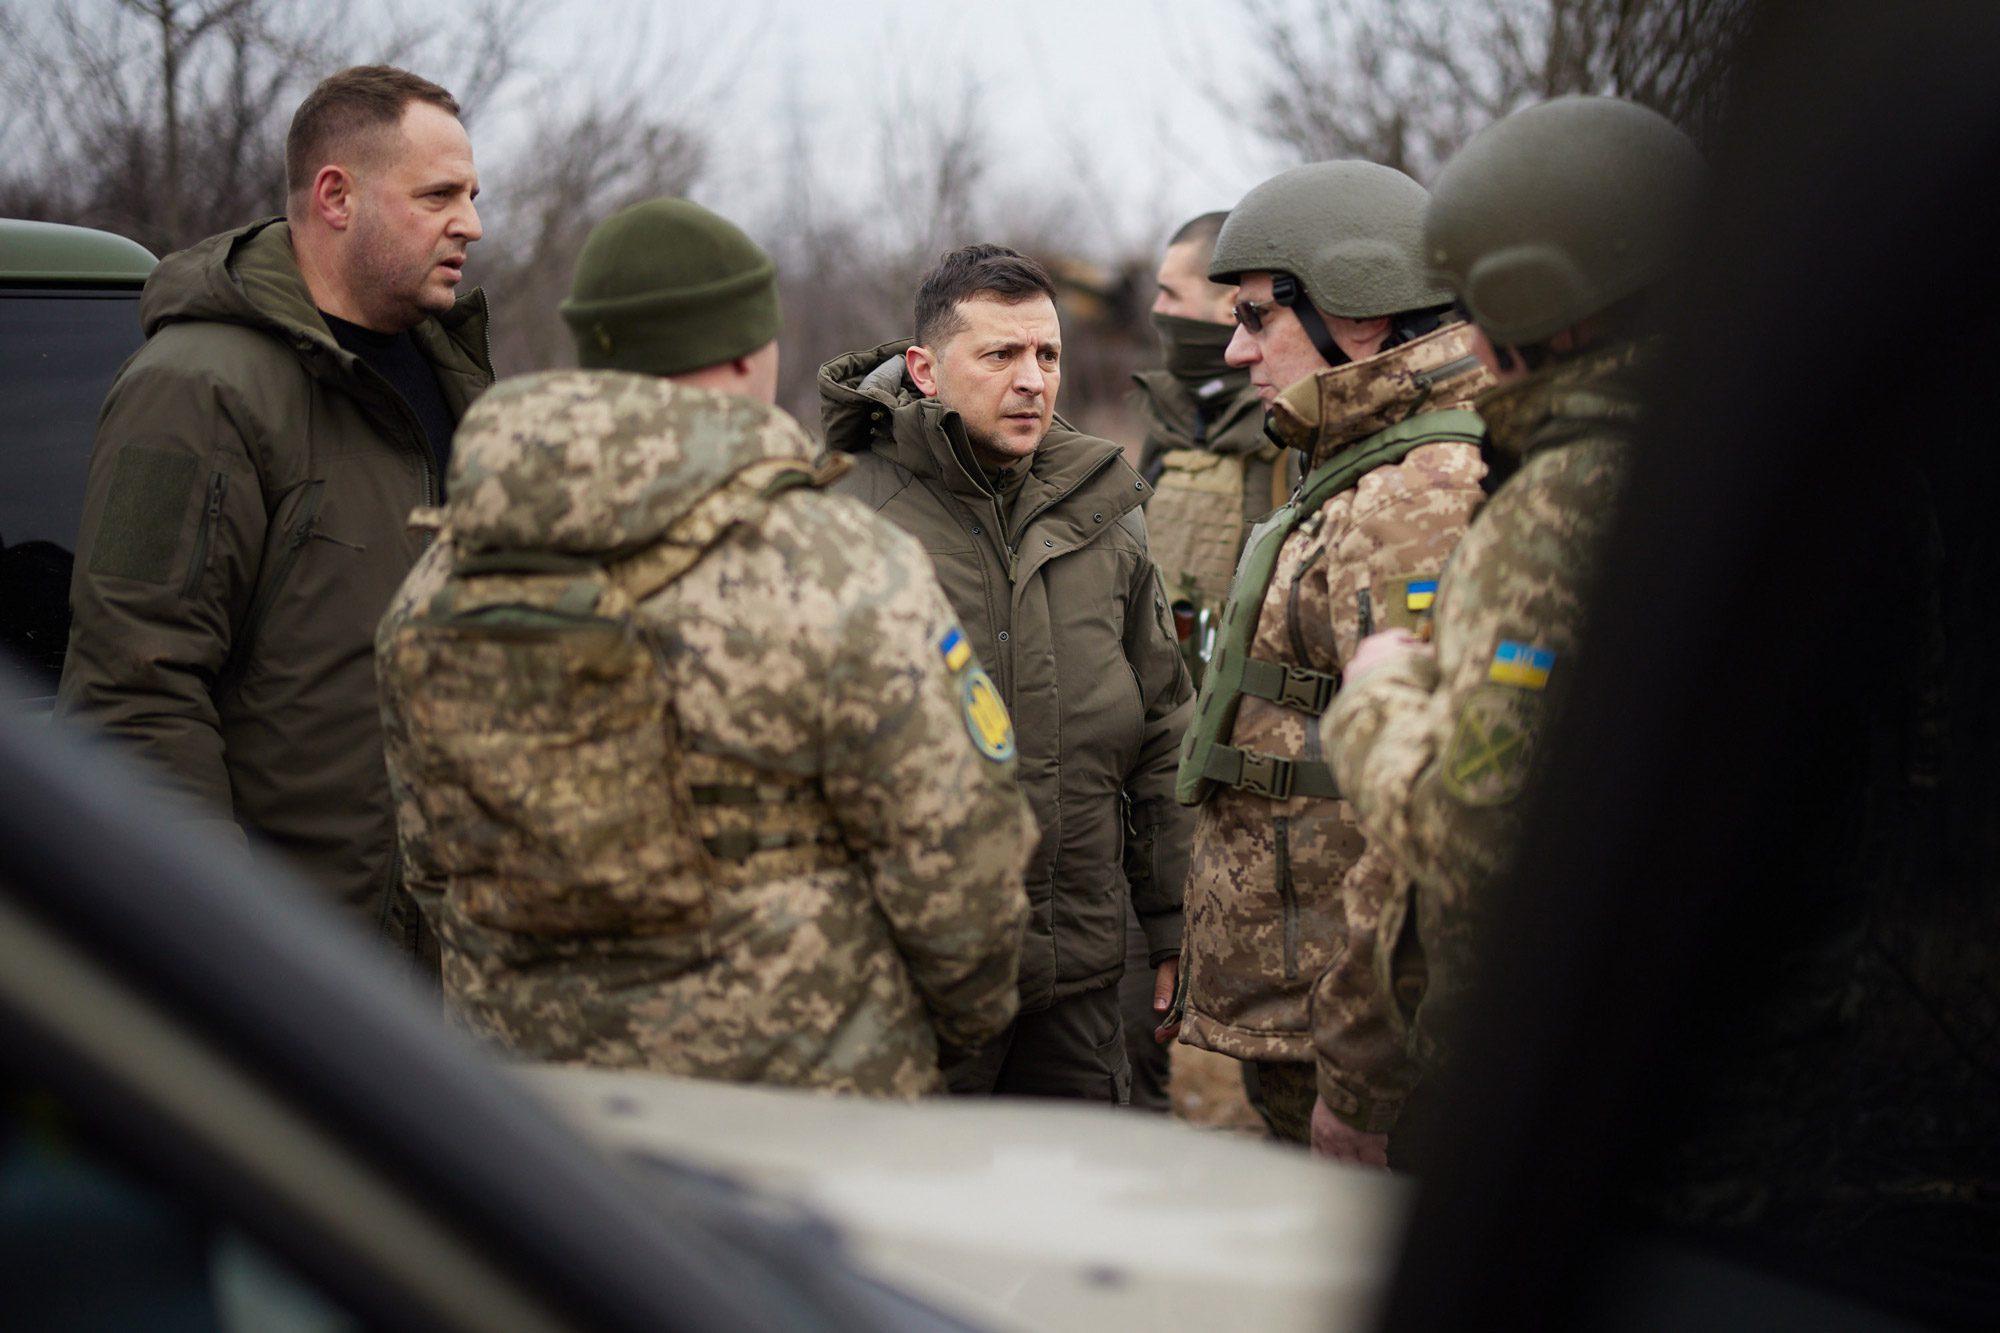 zelenskyi in donbass - <b>Russia Moves Military To Ukrainian Border.</b> We Explain What's Going On - Заборона